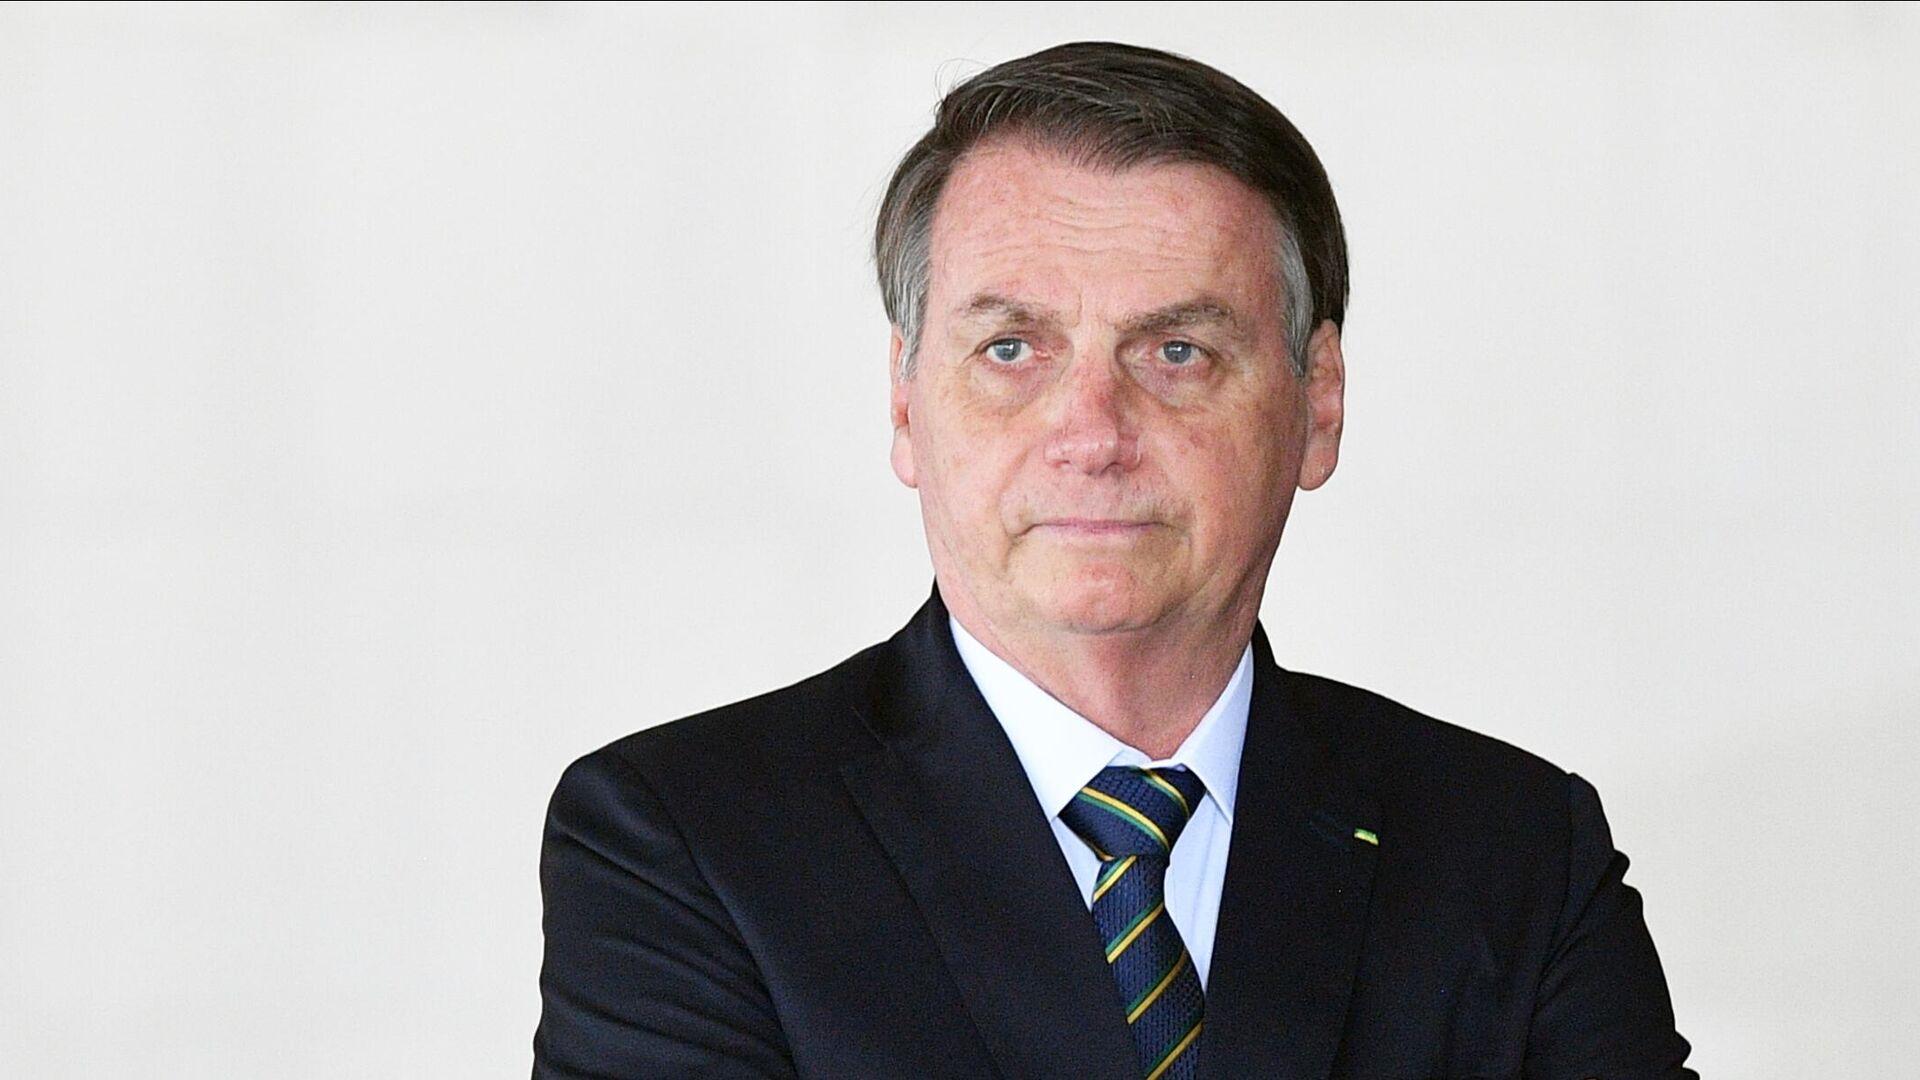 Президент Бразилии Жаир Болсонару - РИА Новости, 1920, 04.11.2020